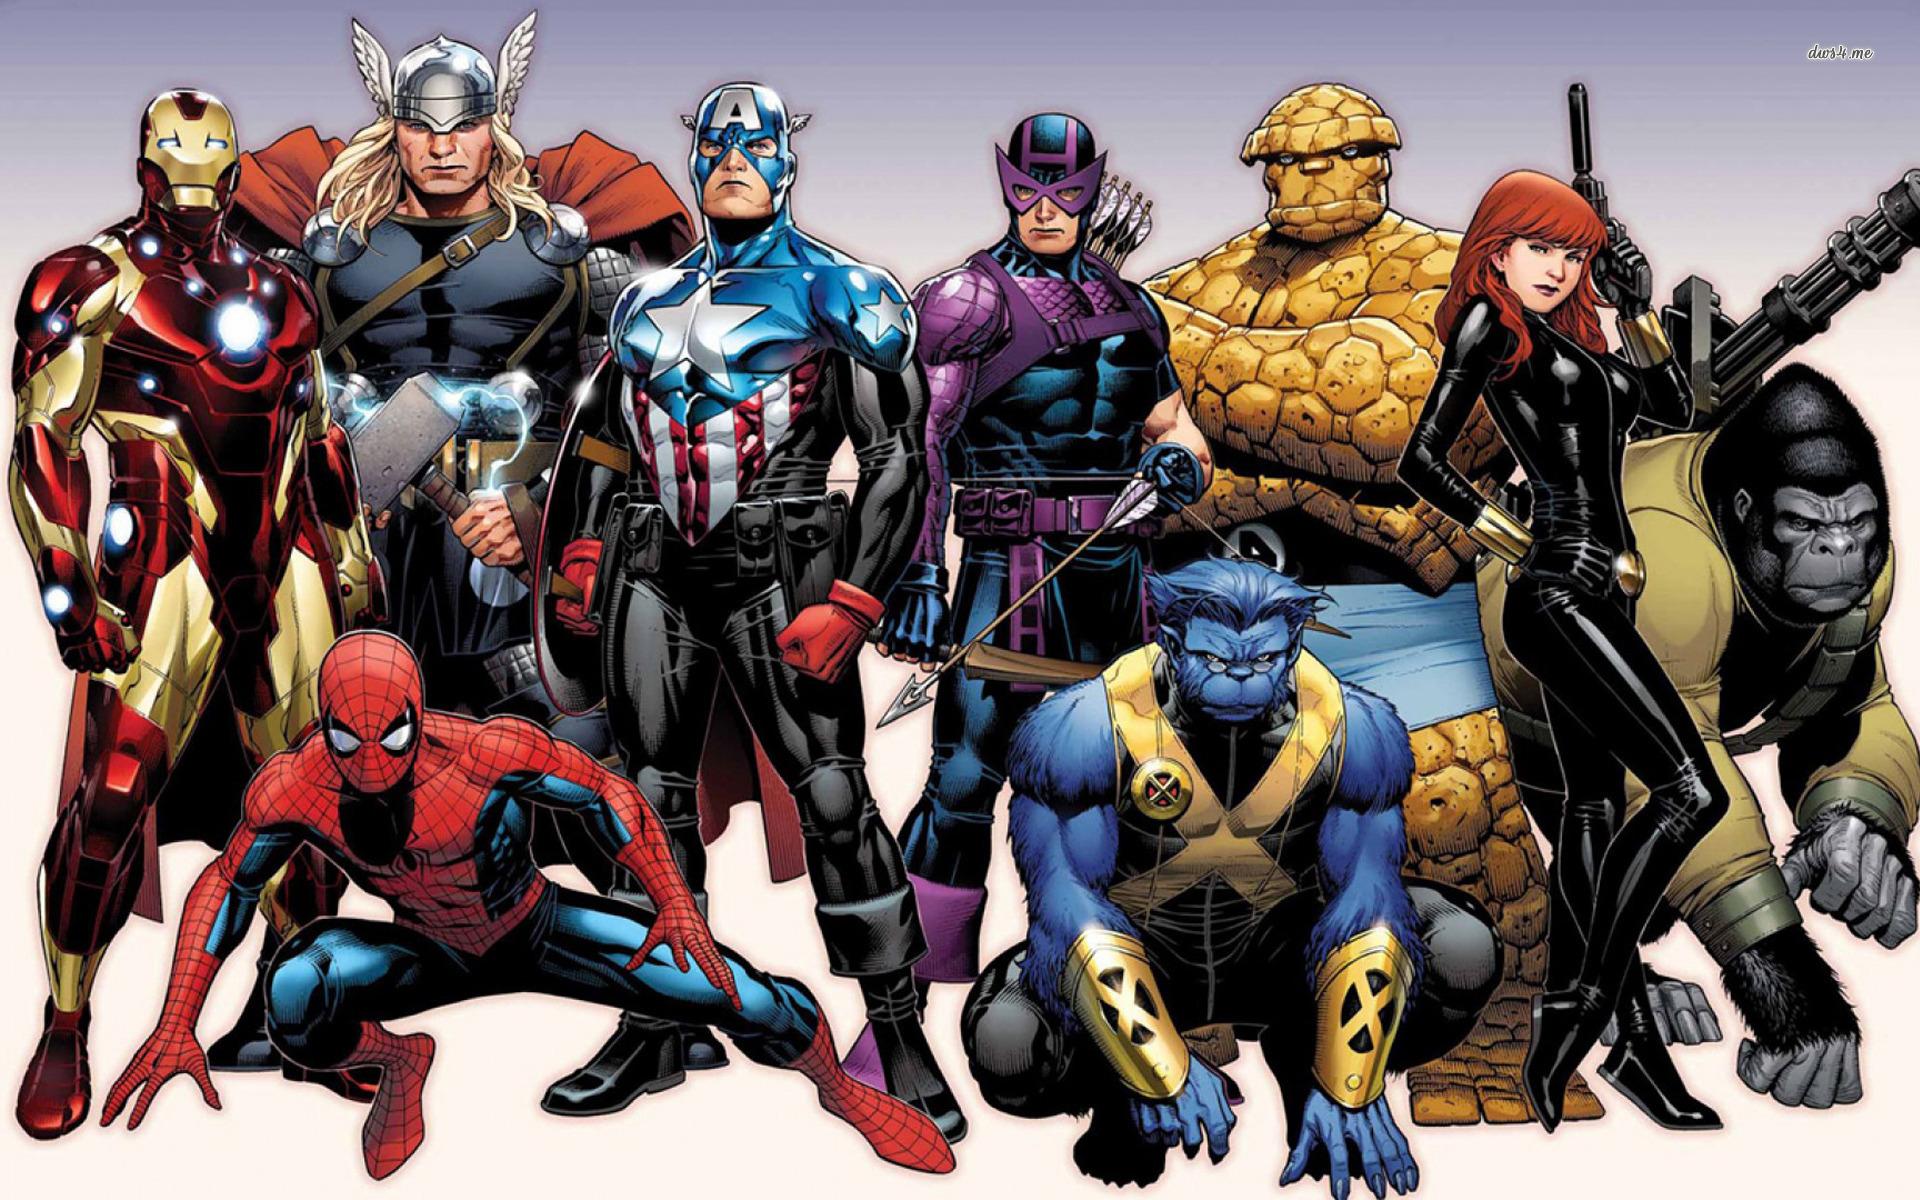 Female Superhero Wallpaper (72+ images)